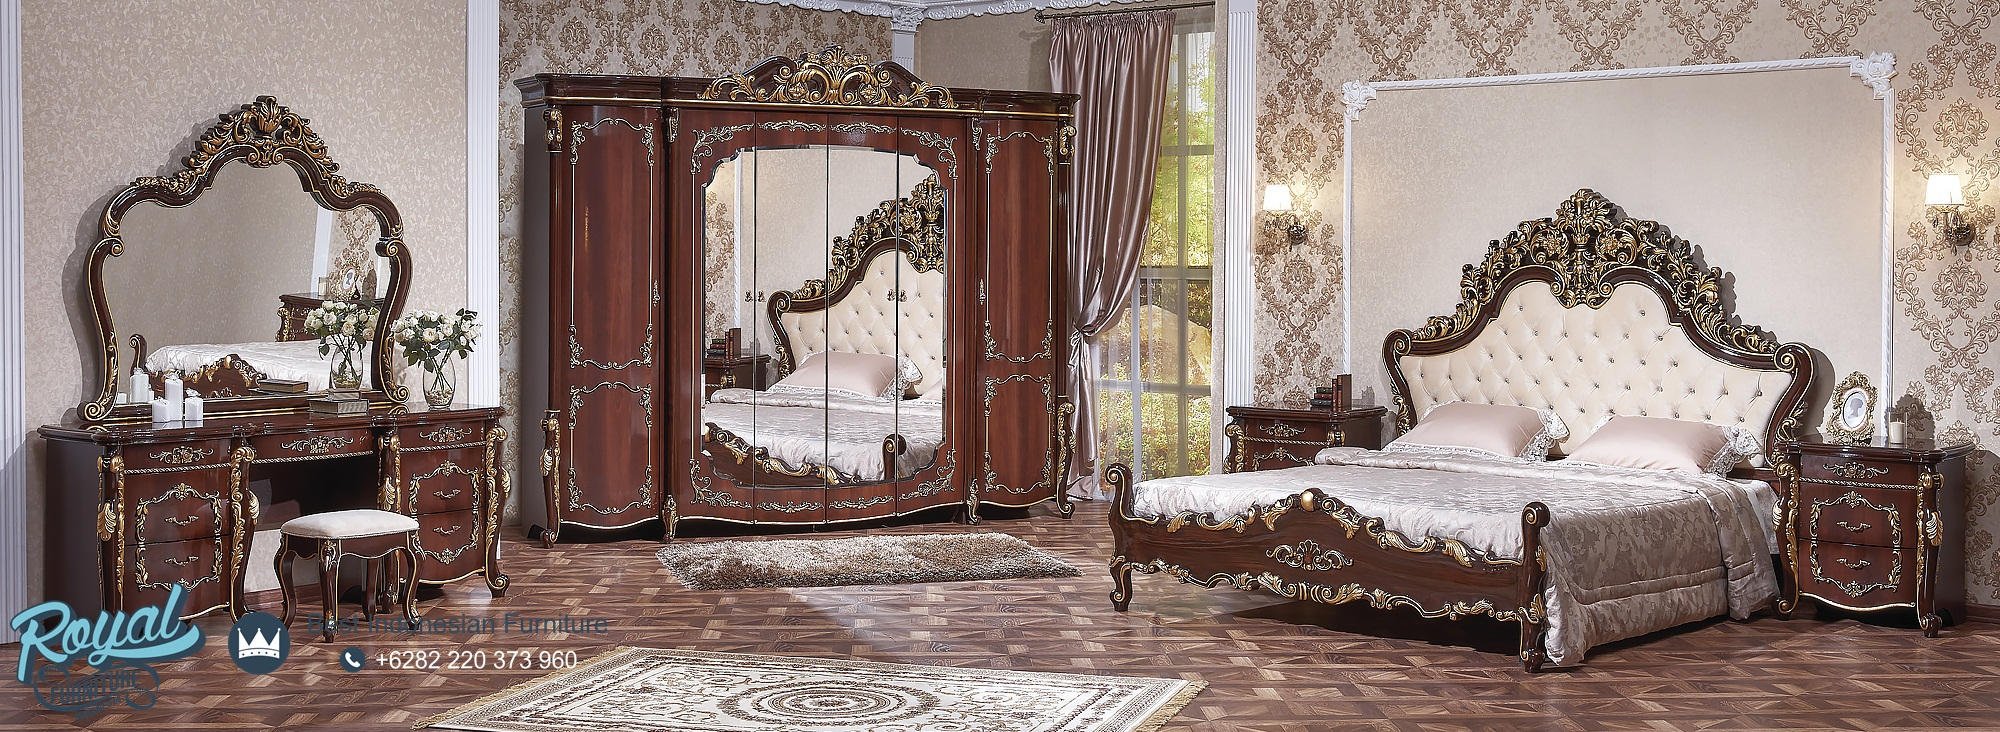 Set Kamar Tidur Mewah Klasik Kayu Jati Ukiran Jepara Veronica, tempat tidur mewah modern, tempat tidur mewah jepara, gambar kamar tidur mewah, desain kamar mewah elegan, tempat tidur mewah klasik, kamar tidur set elegan, kamar tidur mewah modern, tempat tidur mewah terbaru, model kamar set pengantin terbaru, harga tempat tidur mewah modern, kamar set minimalis mewah, kamar set pengantin jati jepara, set kamar tidur mewah, set kamar tidur klasik, set kamar tidur ukir jepara, kamar set jati jepara, toko furniture kamar tidur jepara, furniture store jepara, mebel jepara, royal furniture